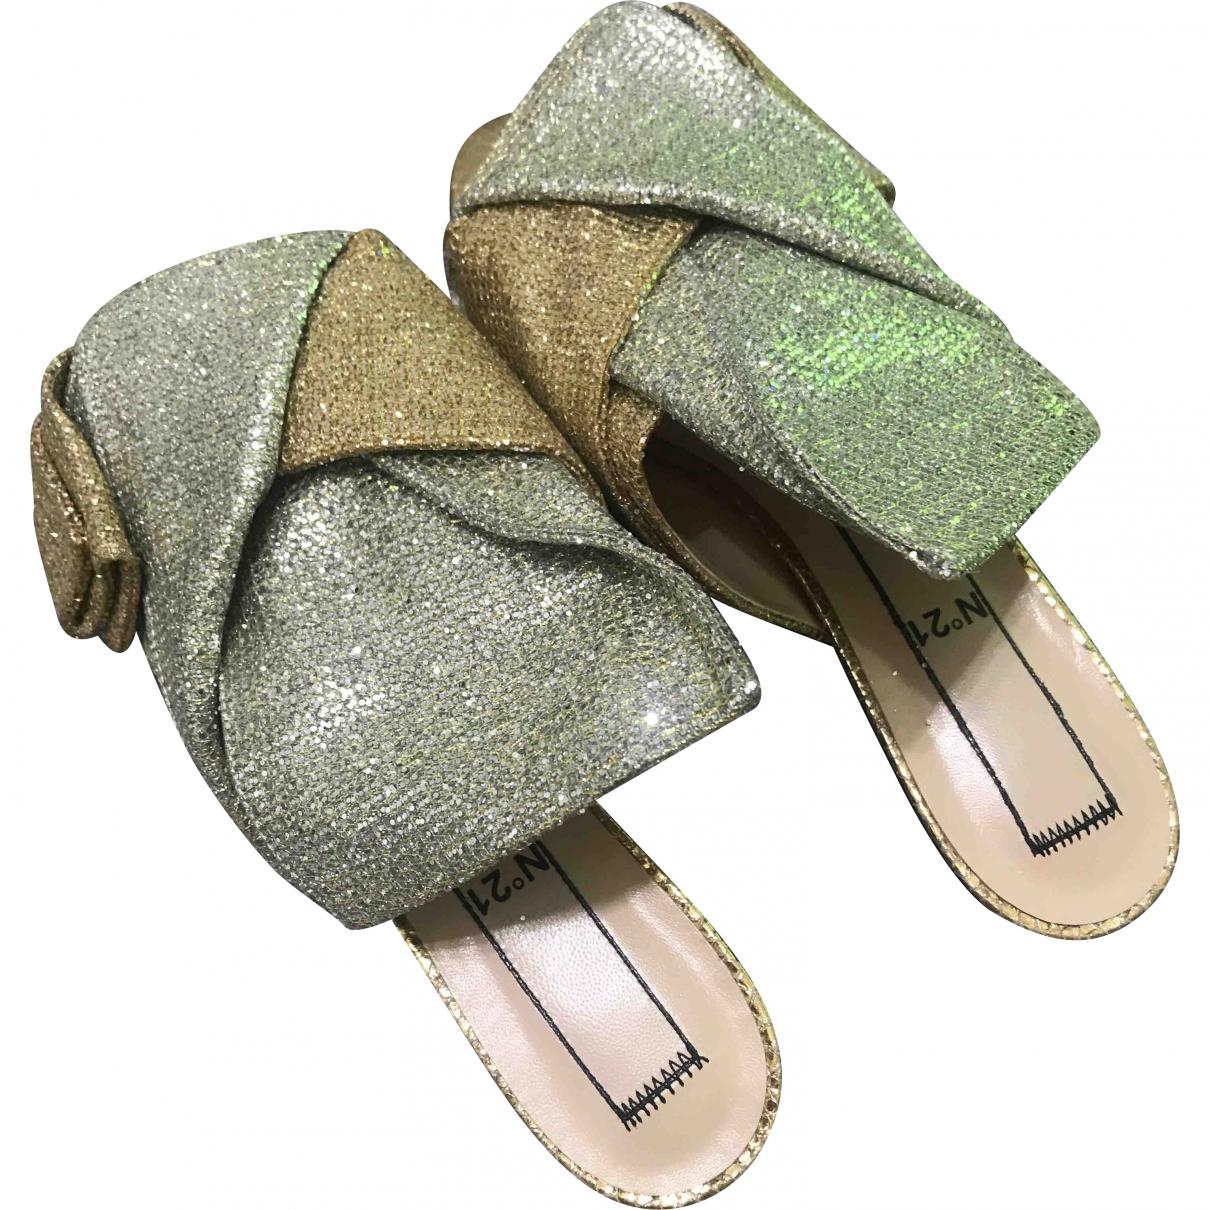 N°21 \N Gold Glitter Sandals for Women 37.5 EU